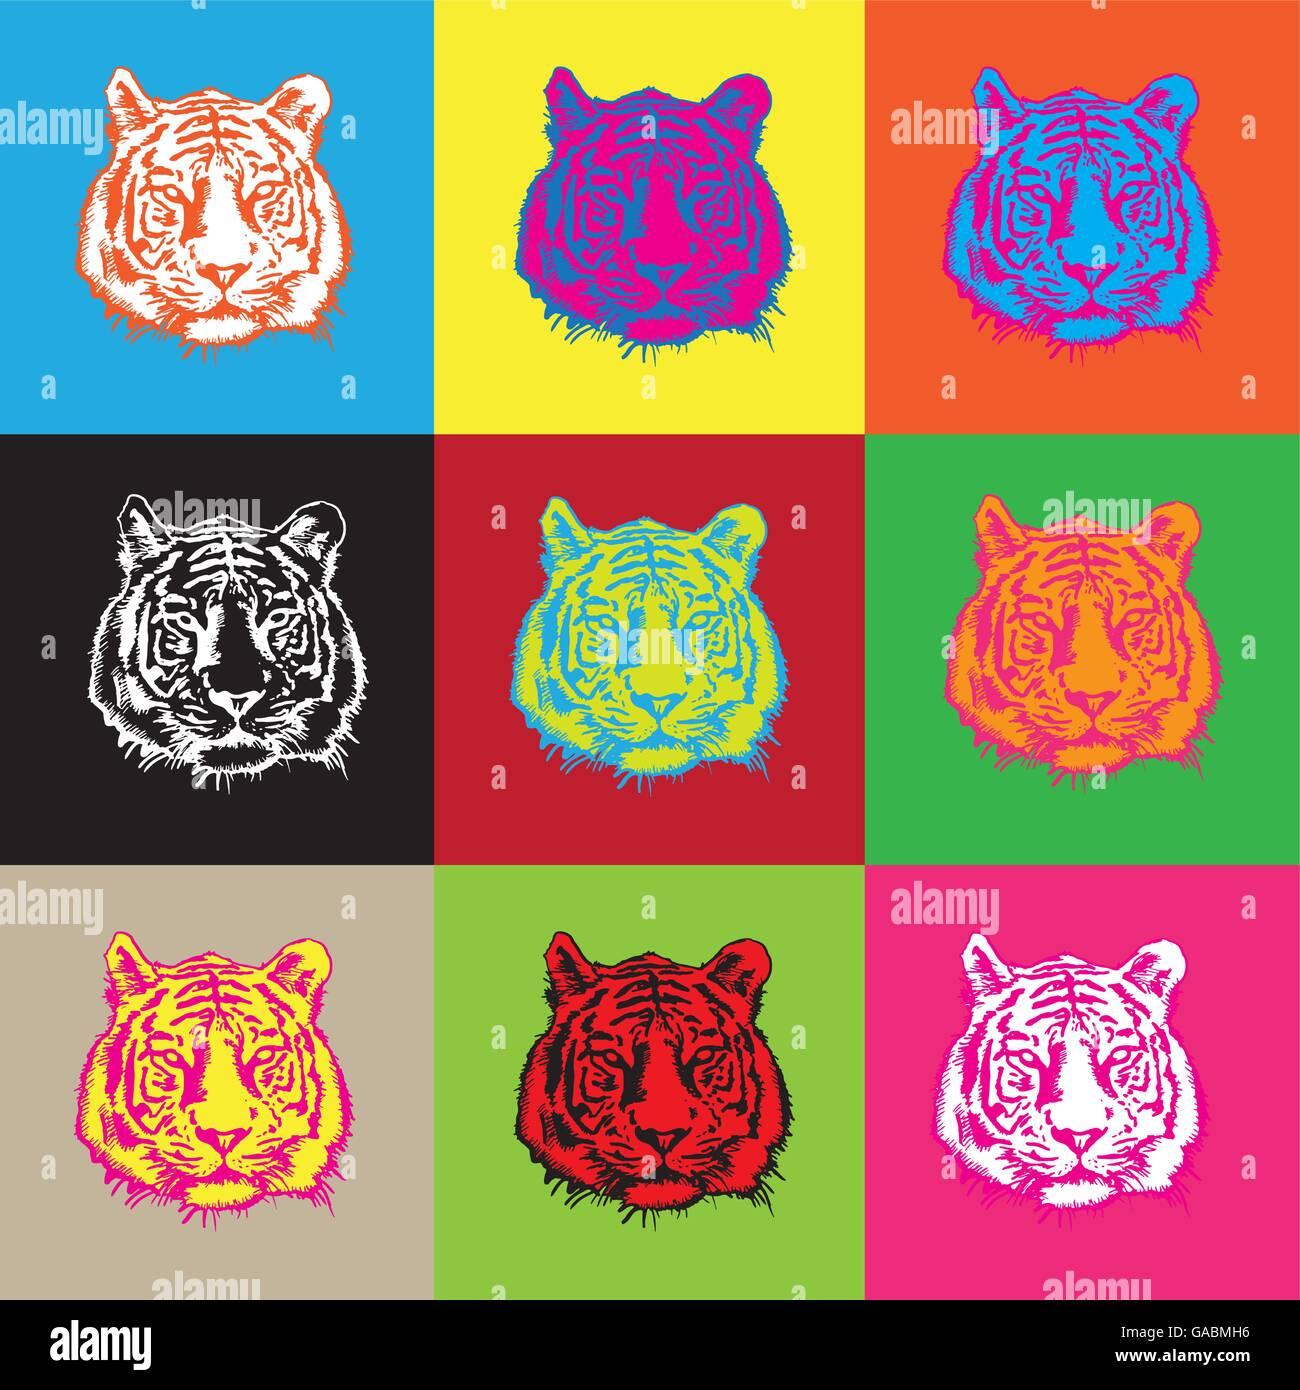 tiger head pop art - Stock Image